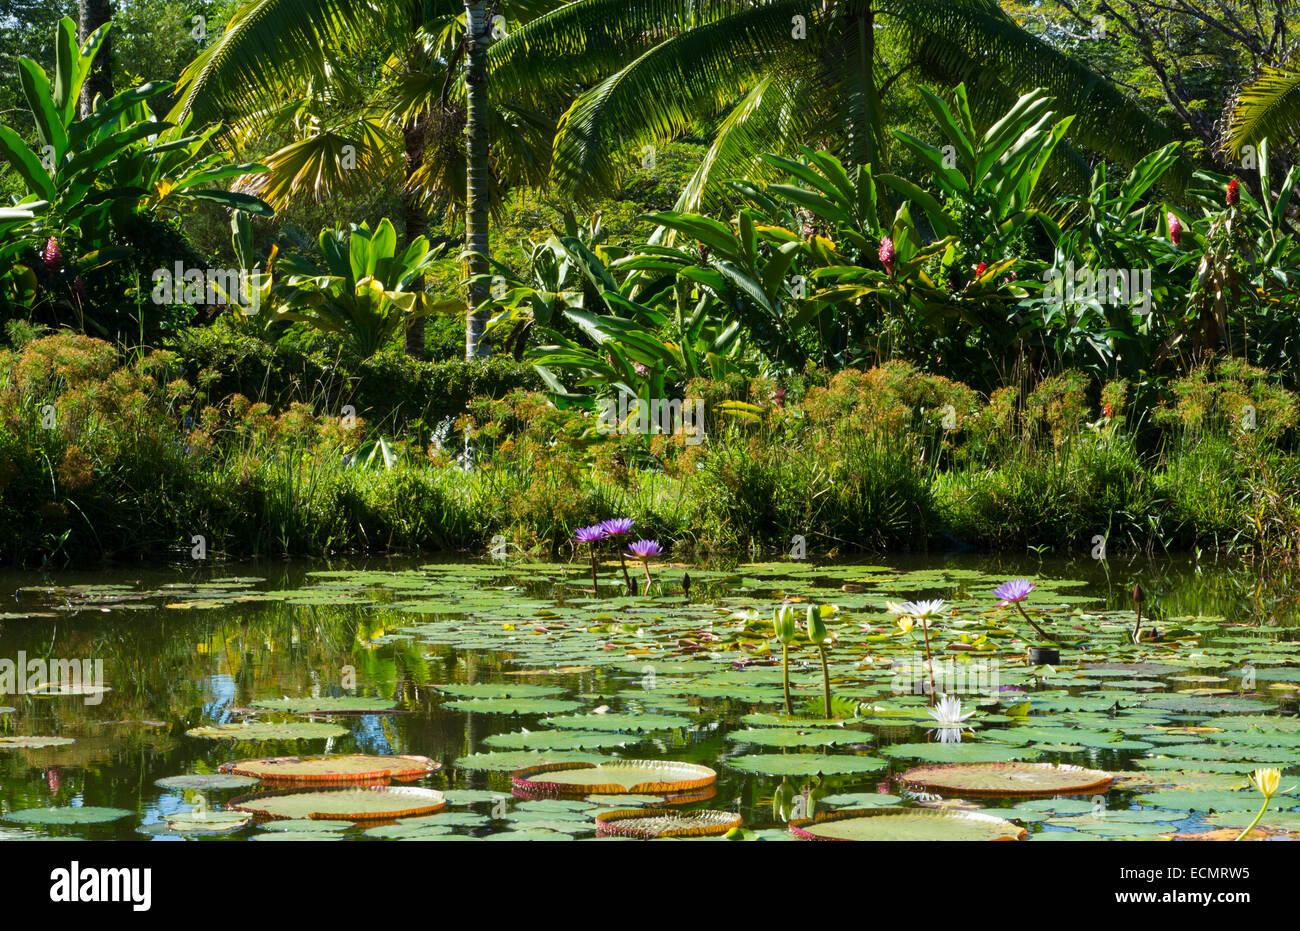 Hilo Hawaii Big Island Panaewa Rain Forest Zoo and Gardens water lillies green peaceful - Stock Image